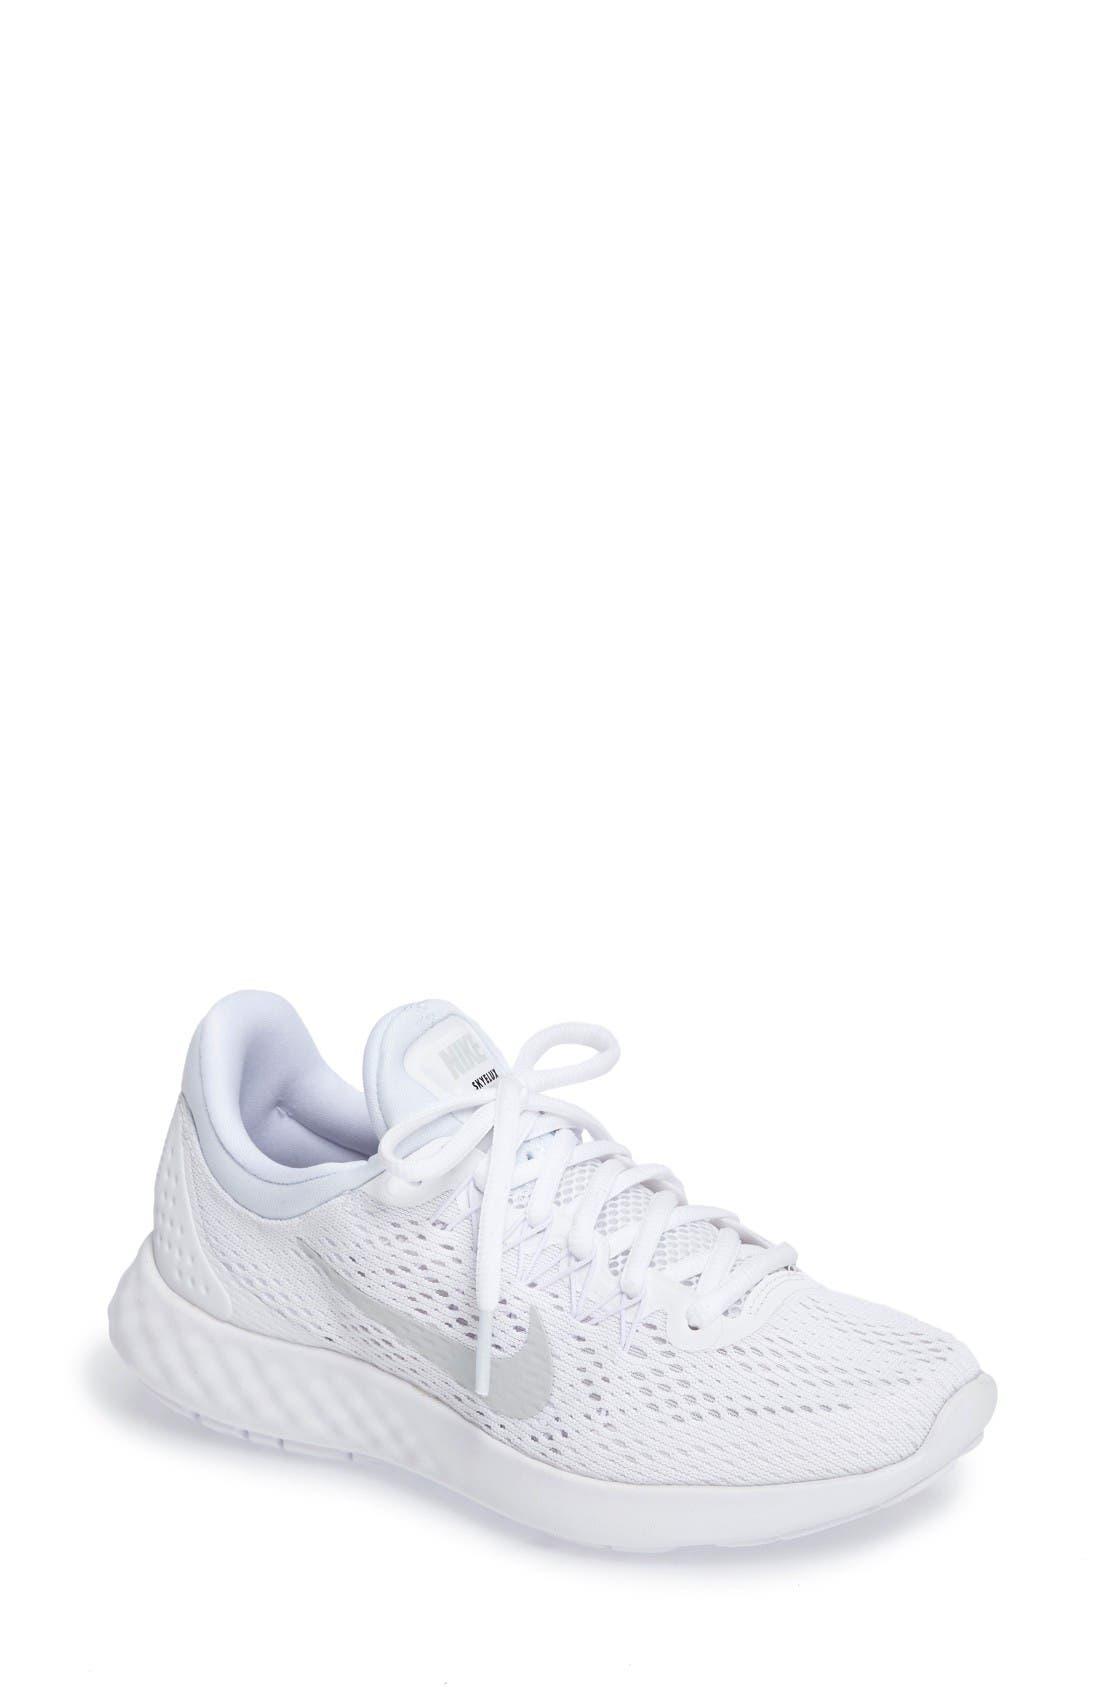 Main Image - Nike Lunar Skyelux Running Shoe (Women)